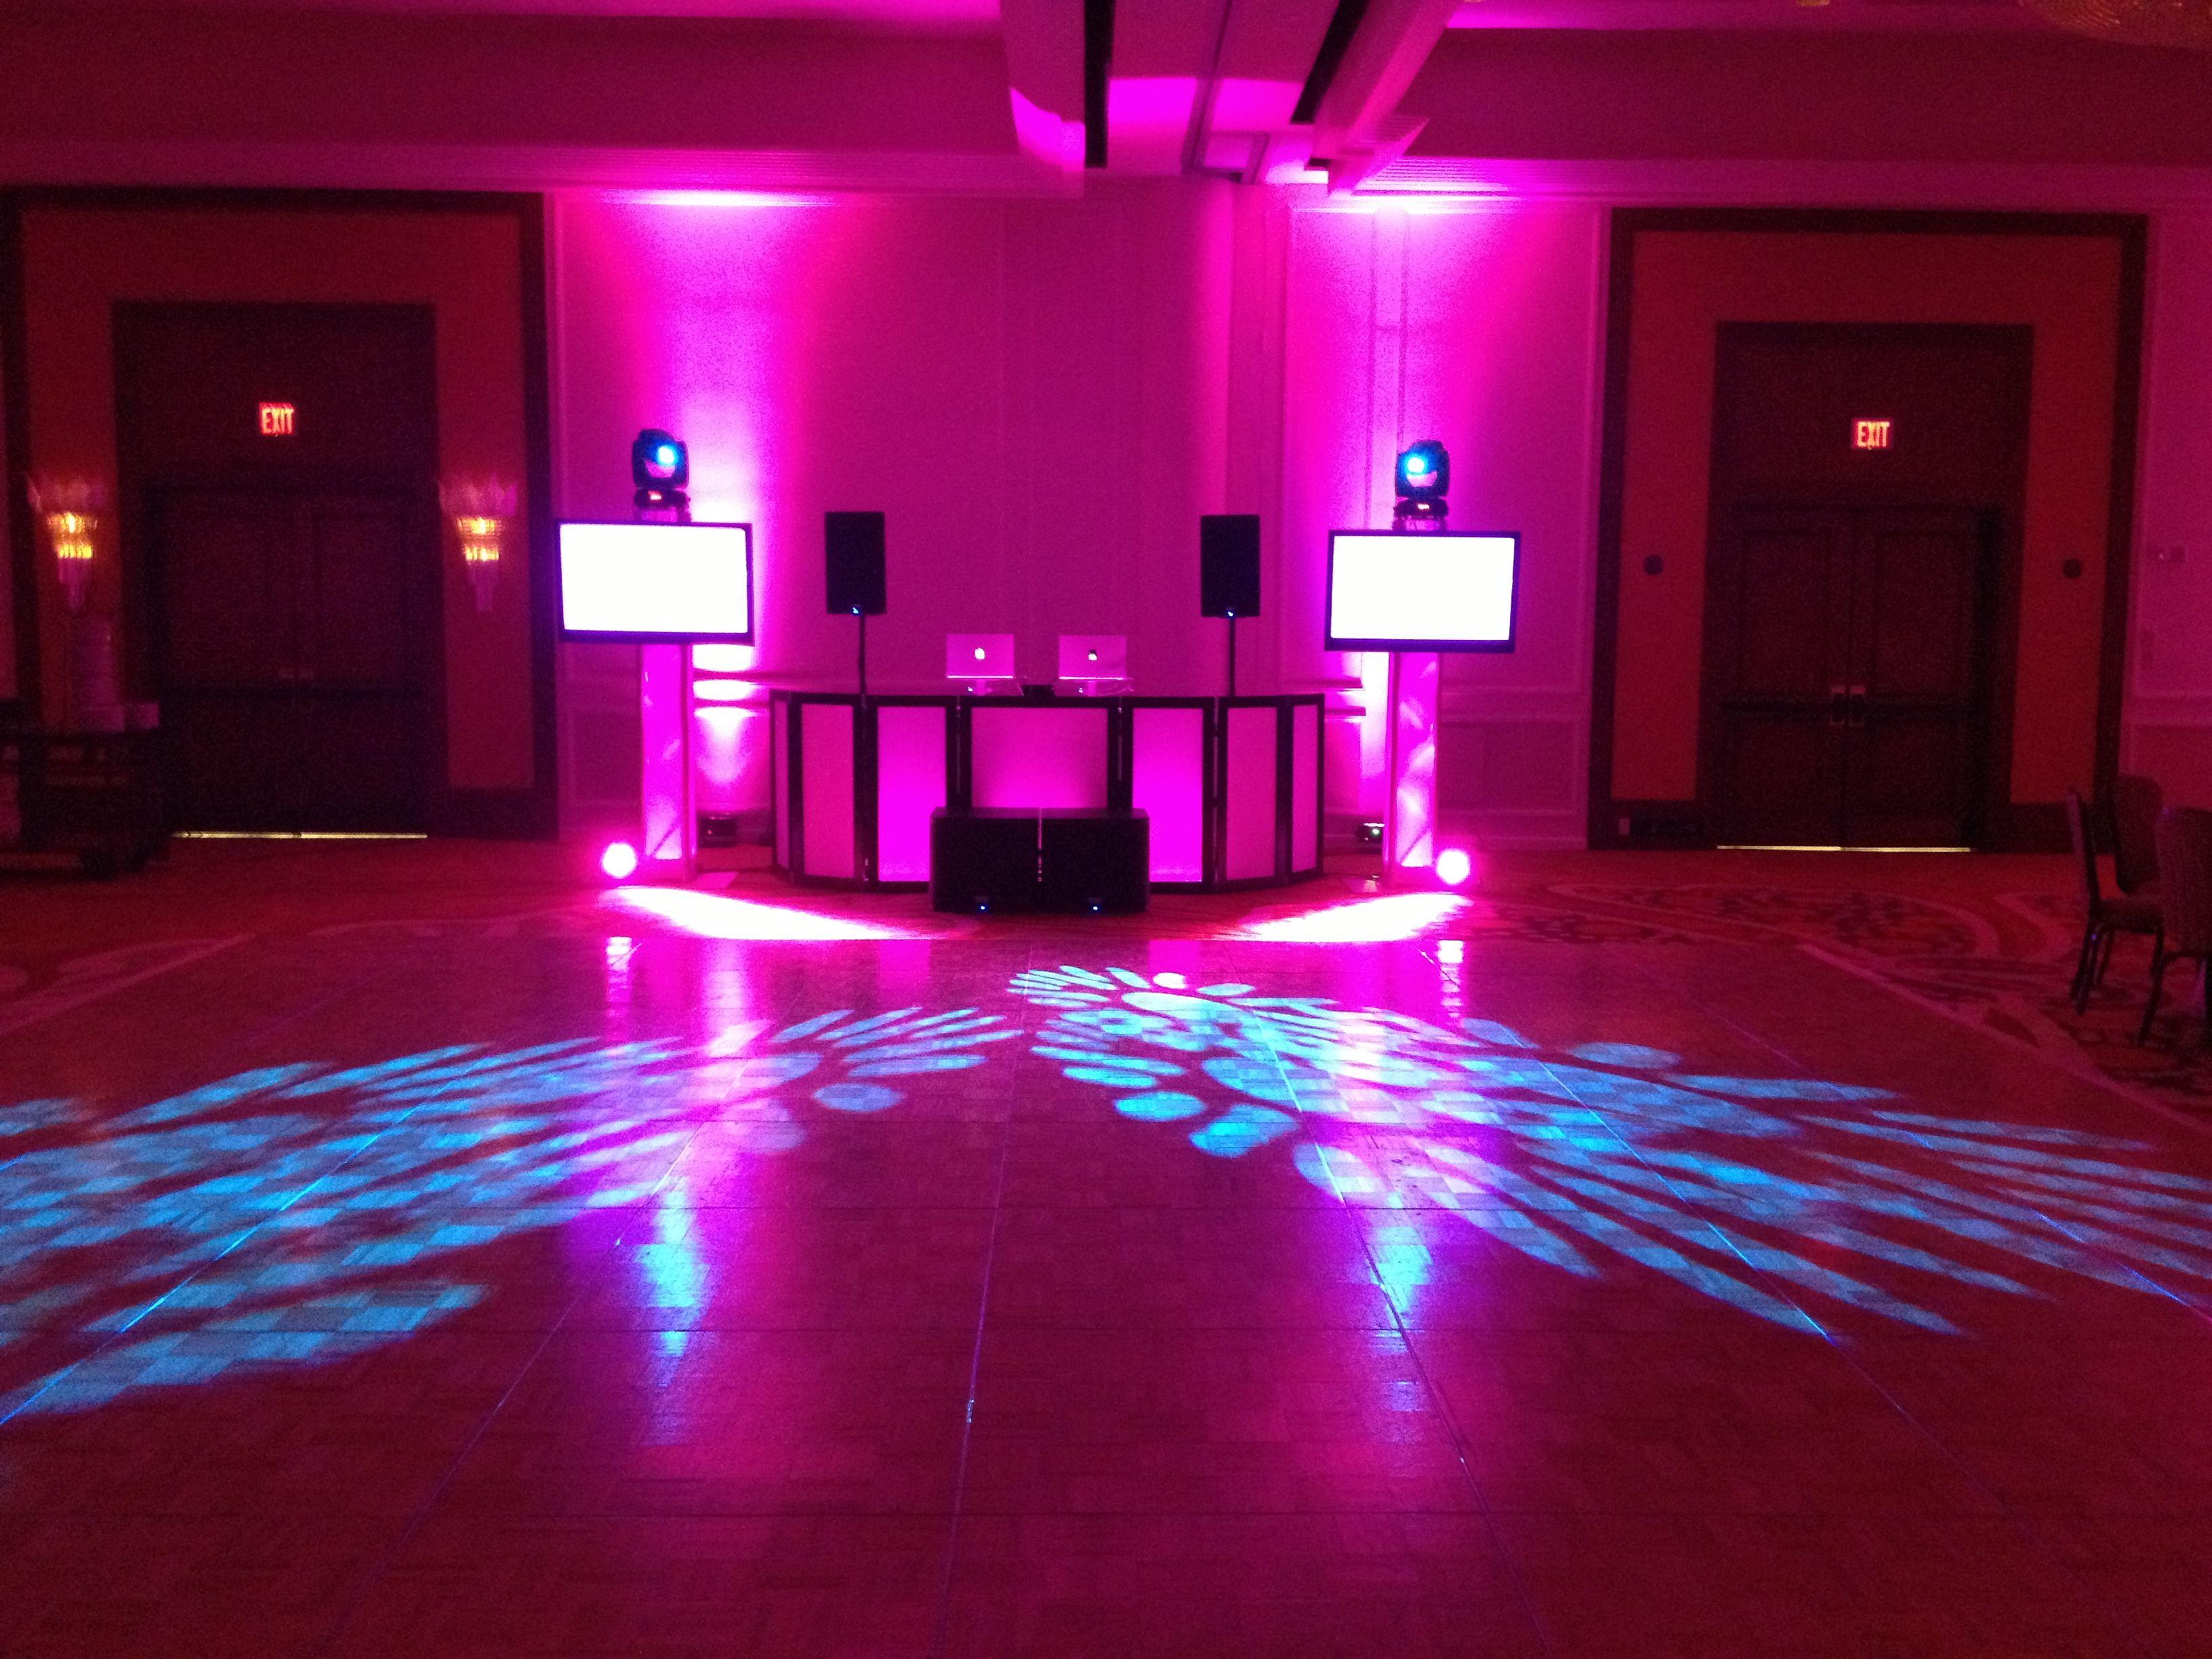 Dj Multimedia Setup With Computer Controlled Up Lighting Intelligent Lighting And Custom Dj Booth Marco Island Marriott Weddin Pista Led Dj Eventos Cabina Dj